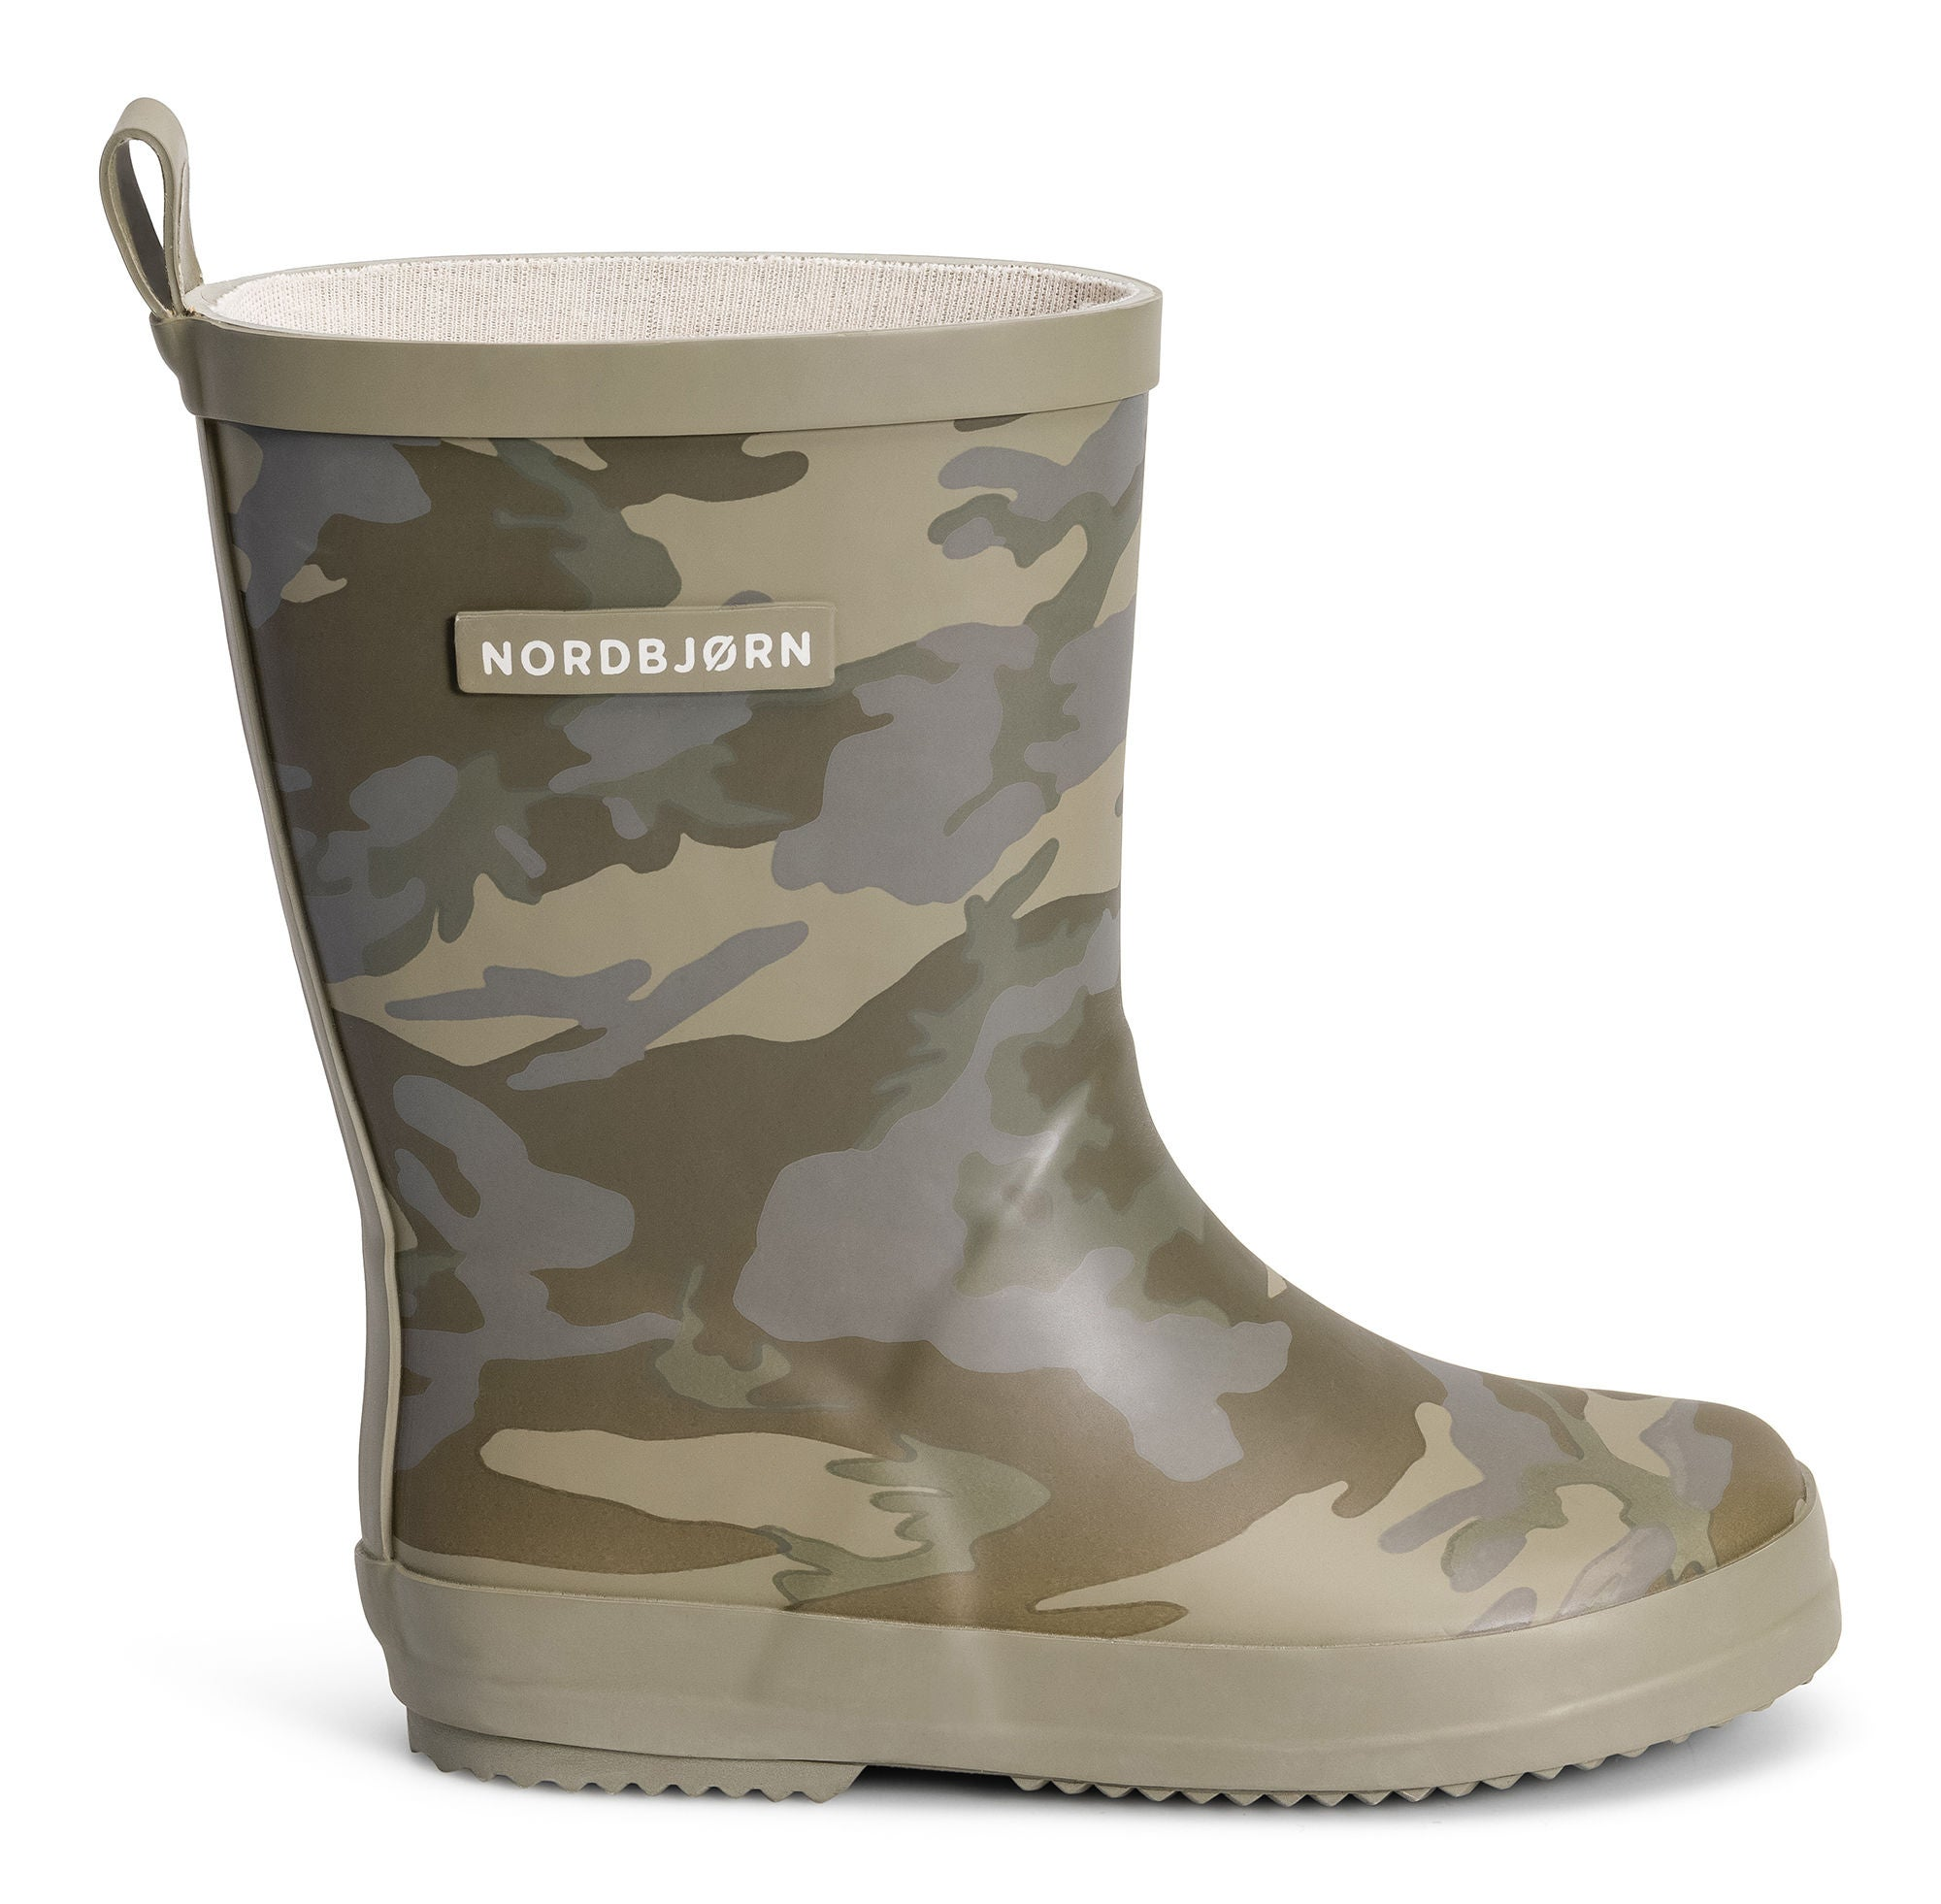 886060a4fe6 Kjøp Nordbjørn Whirlwind Gummistøvel, Camouflage | Jollyroom